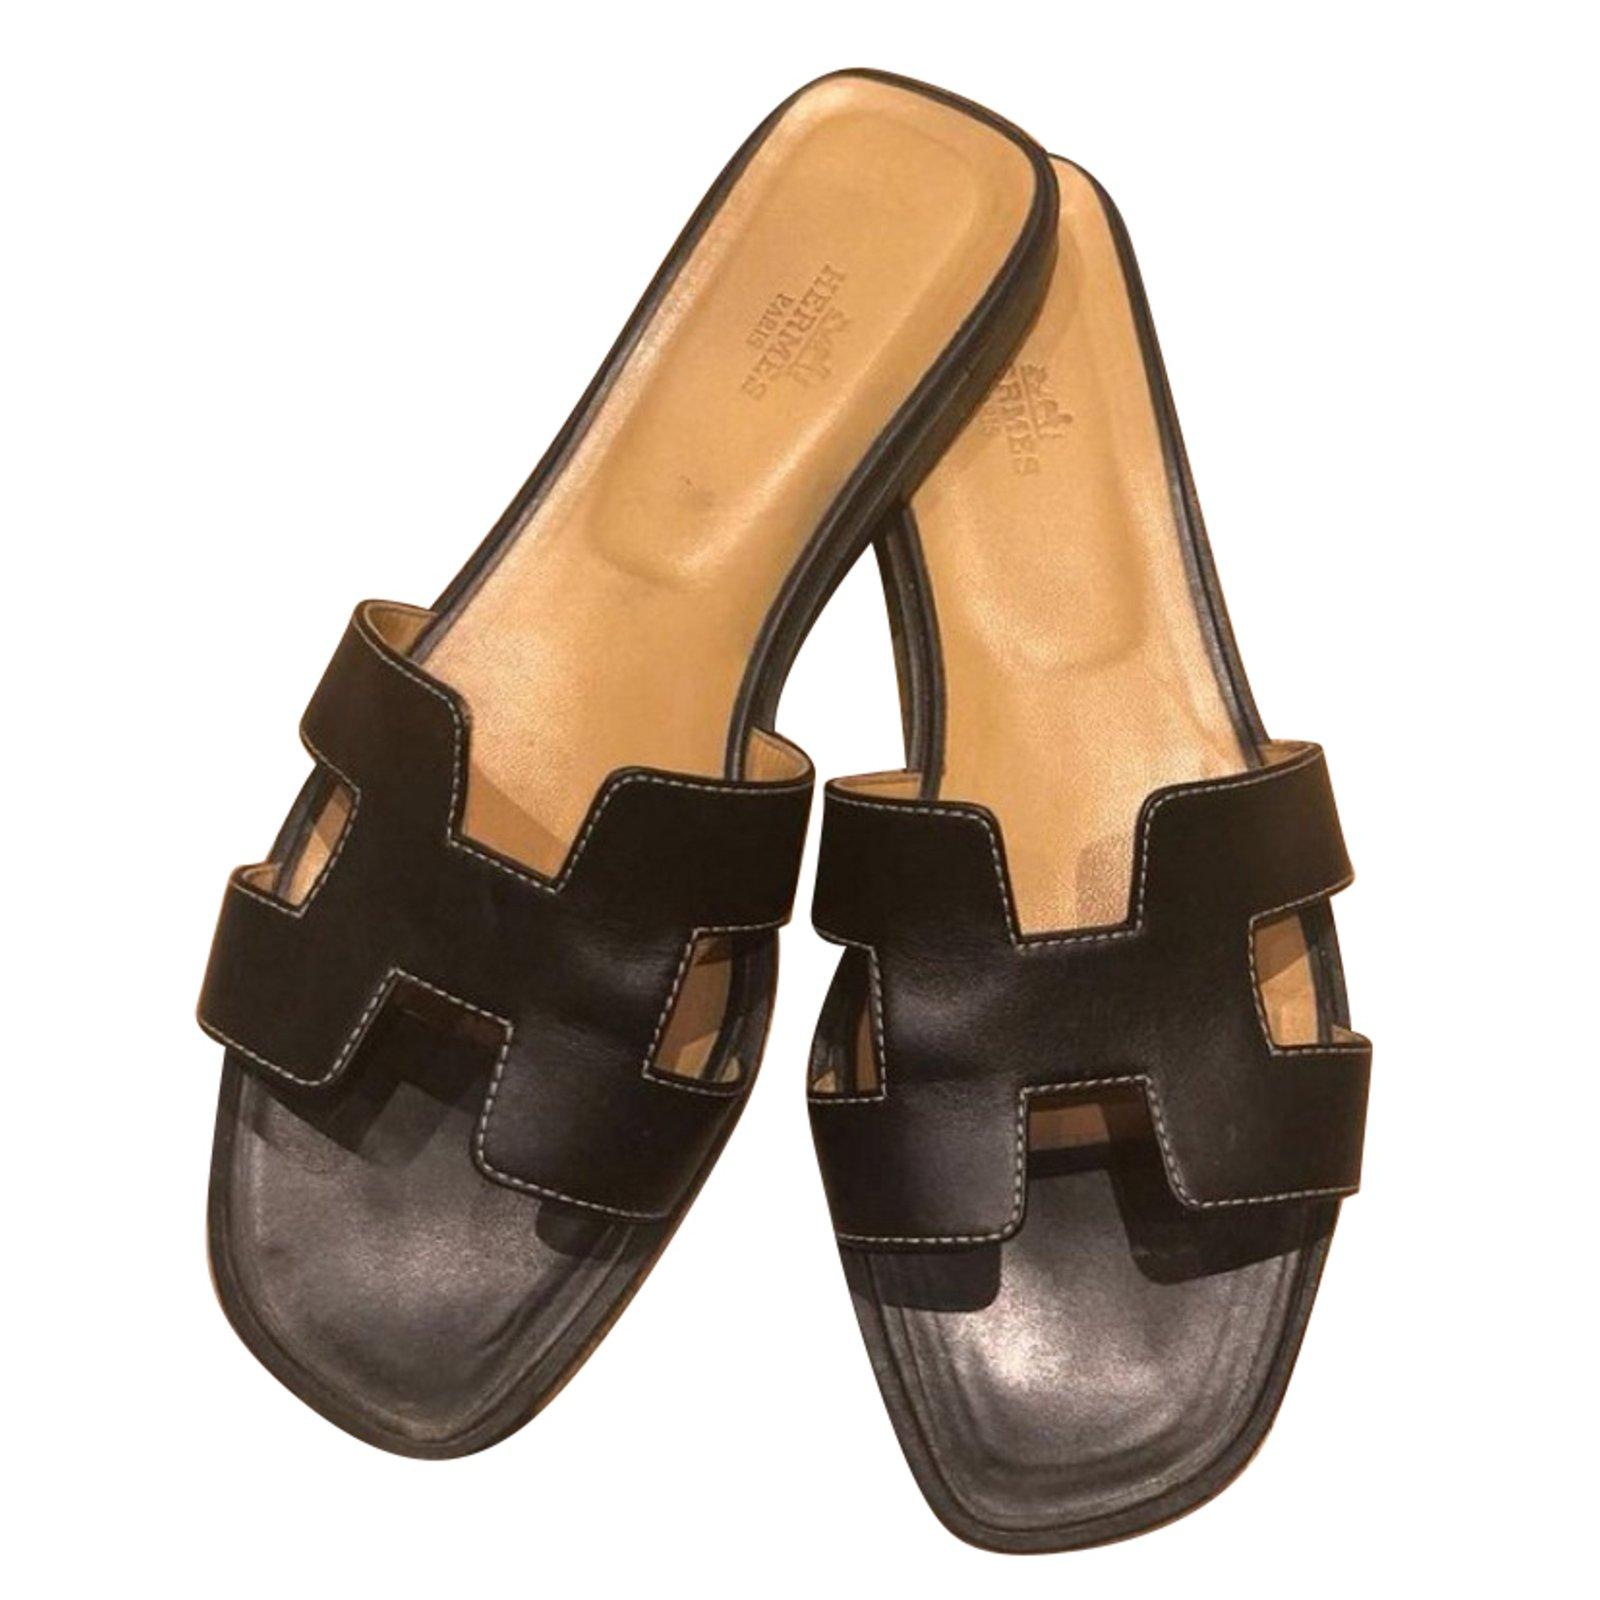 9753747ff0c6 Hermès sandals leather black ref joli closet jpg 1600x1600 Hermes sandals